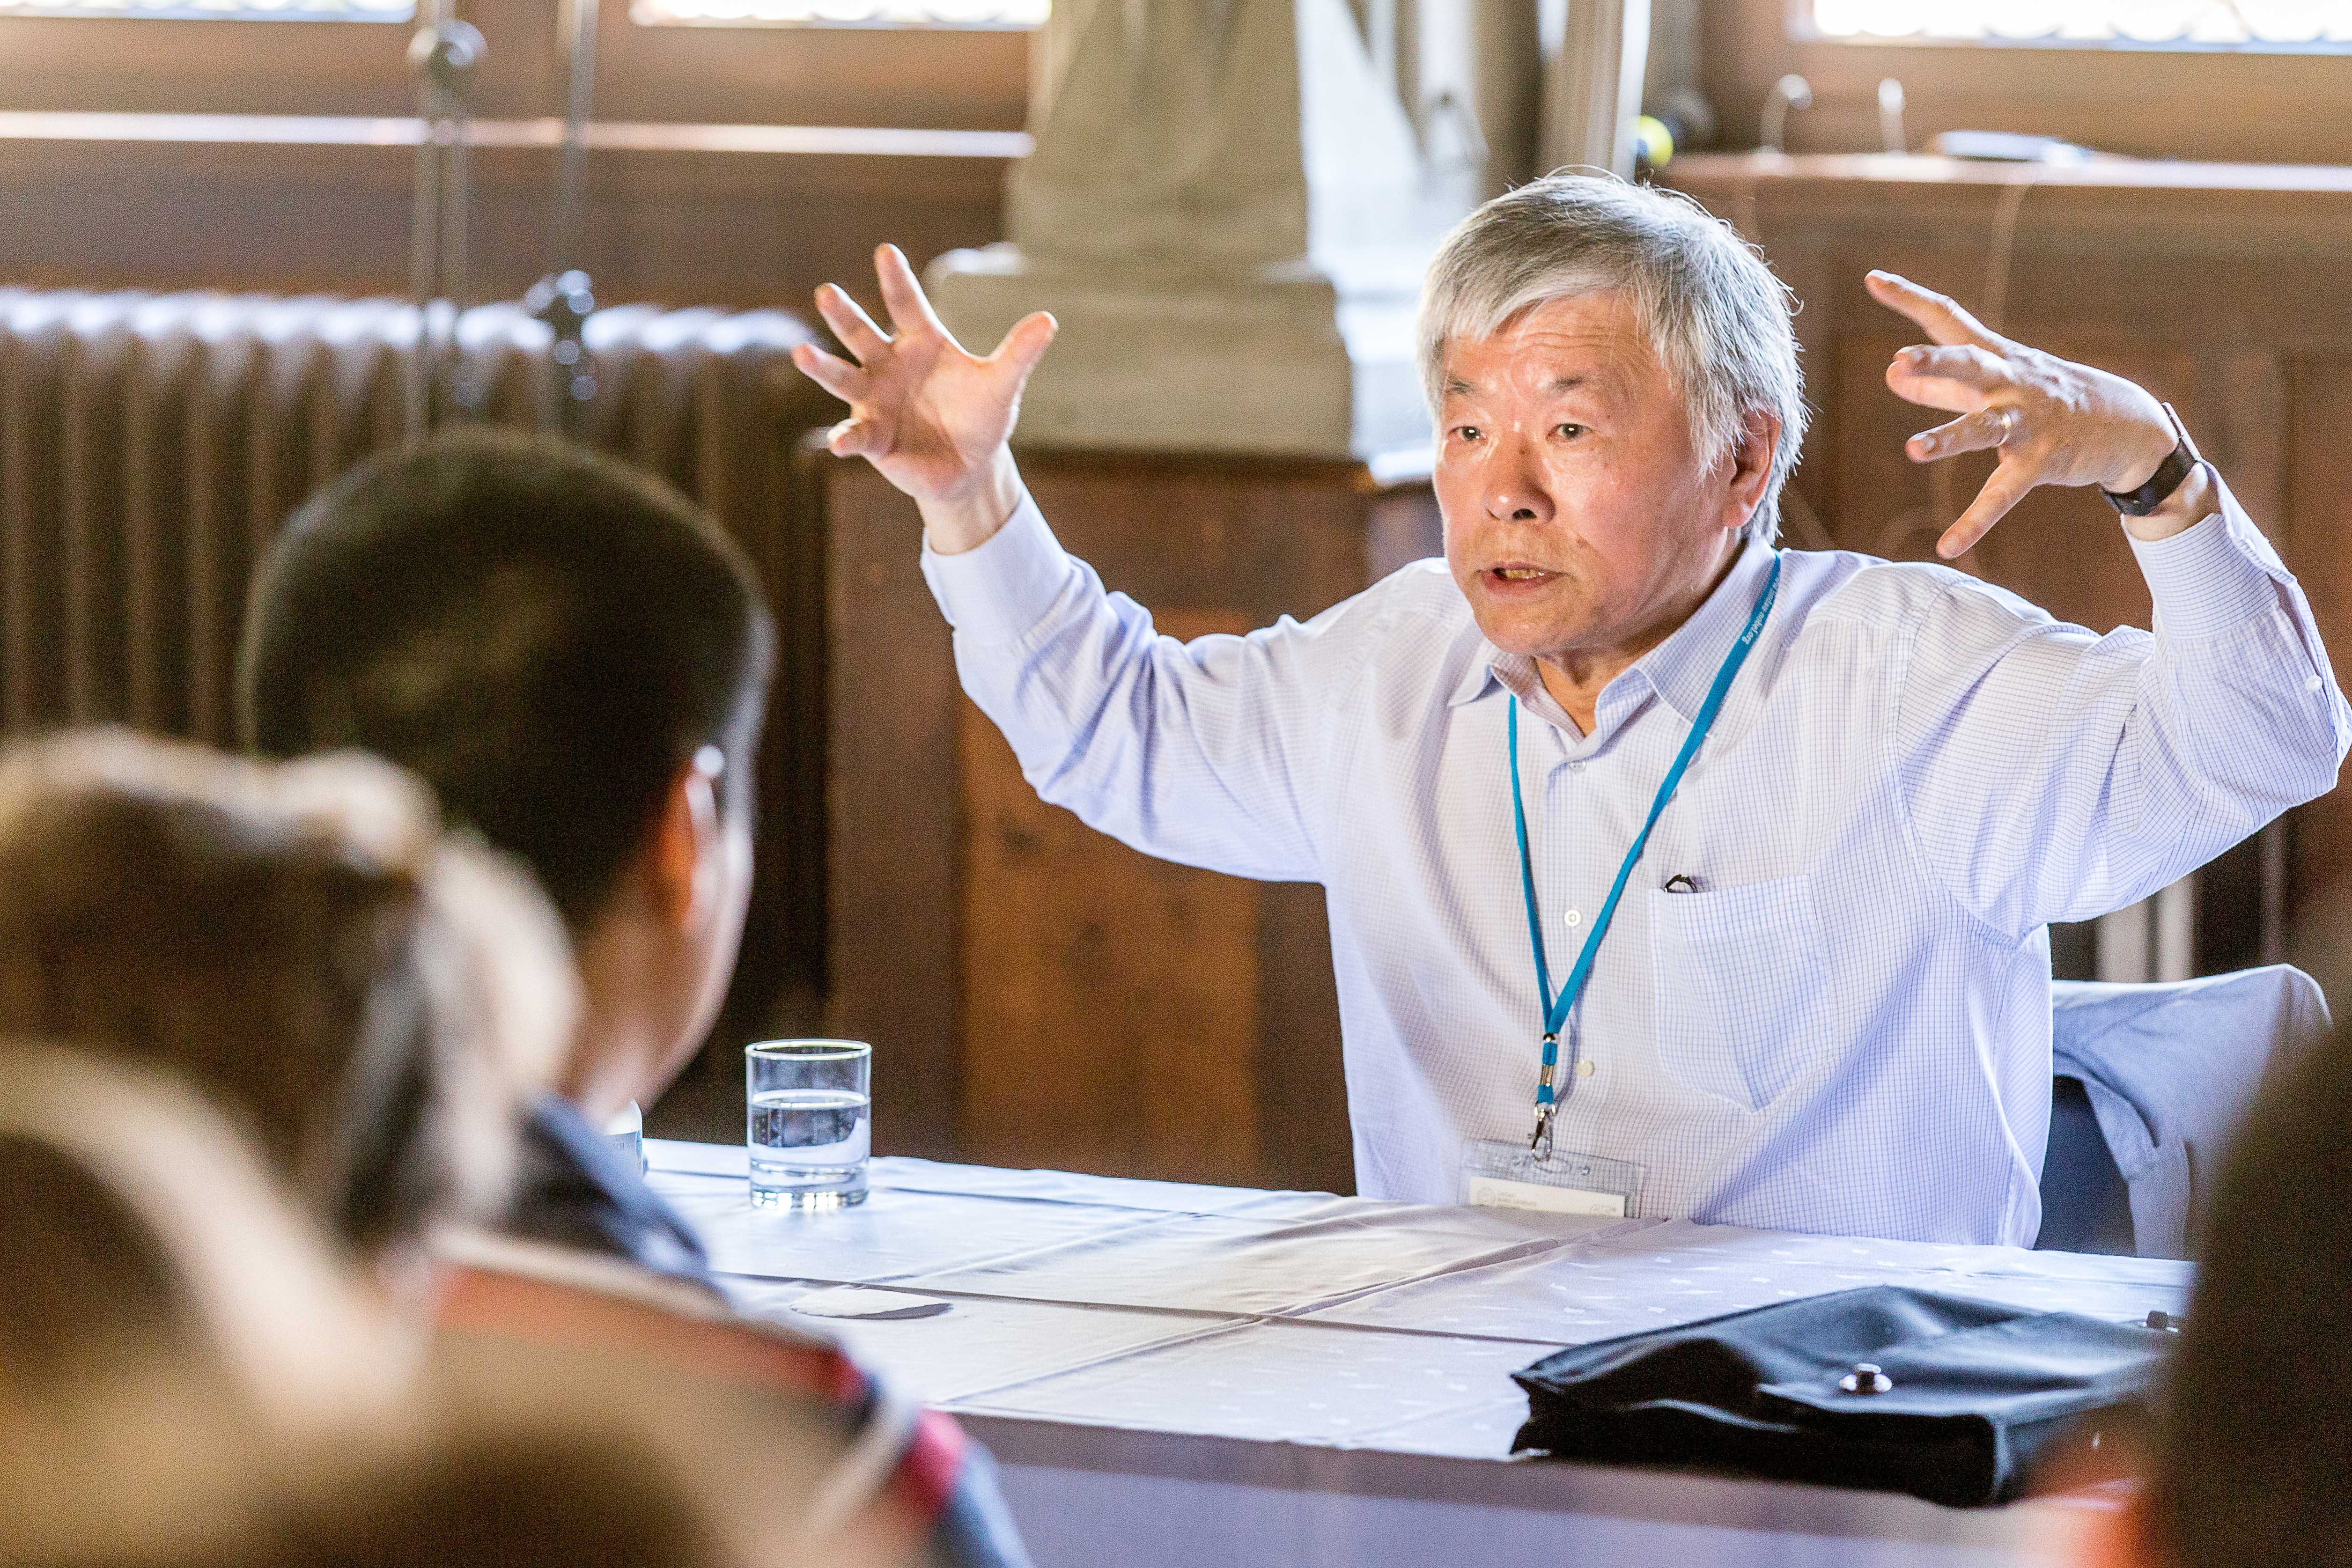 Susumu Tonegawa 2015 in Lindau bei einer Diskussionsrunde mit jungen Wissenschaftlern. Foto: Ch. Flemming/Lindau Nobel Laureate Meetings.